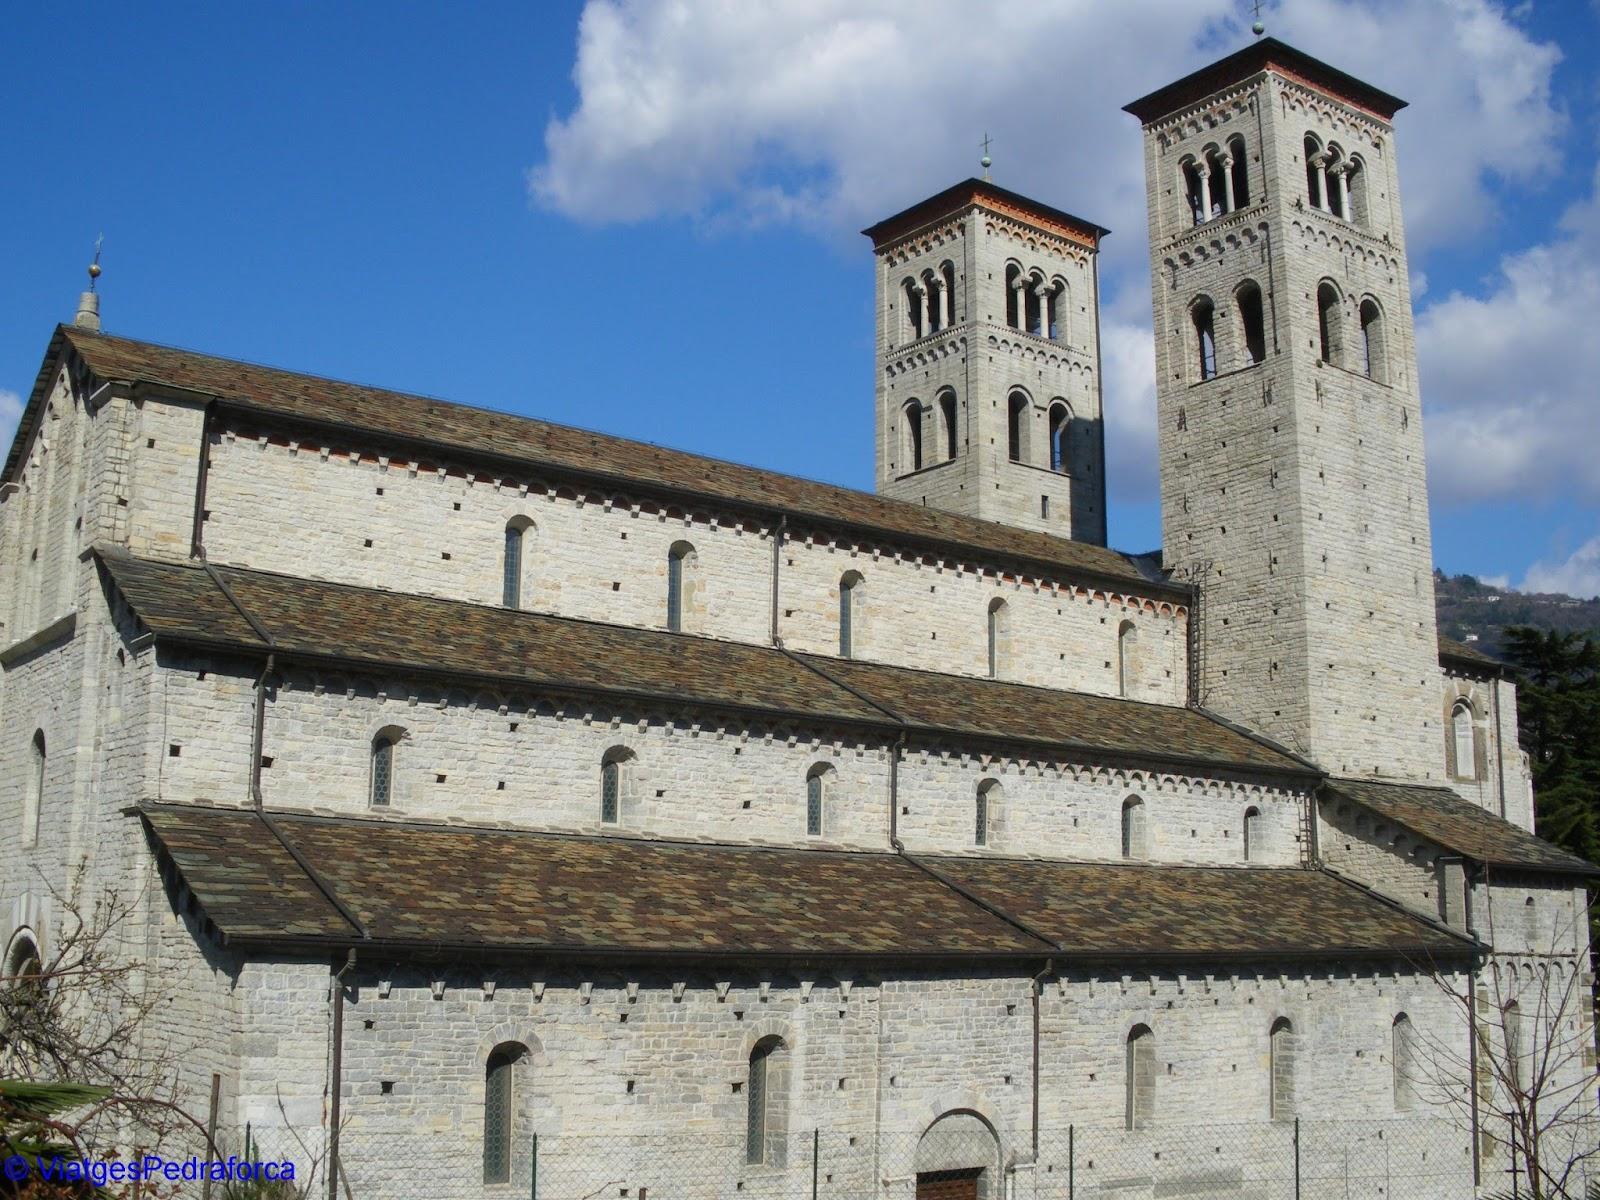 Sant'Abbondio, Como, Llombardia, Itàlia, Romànic llombard